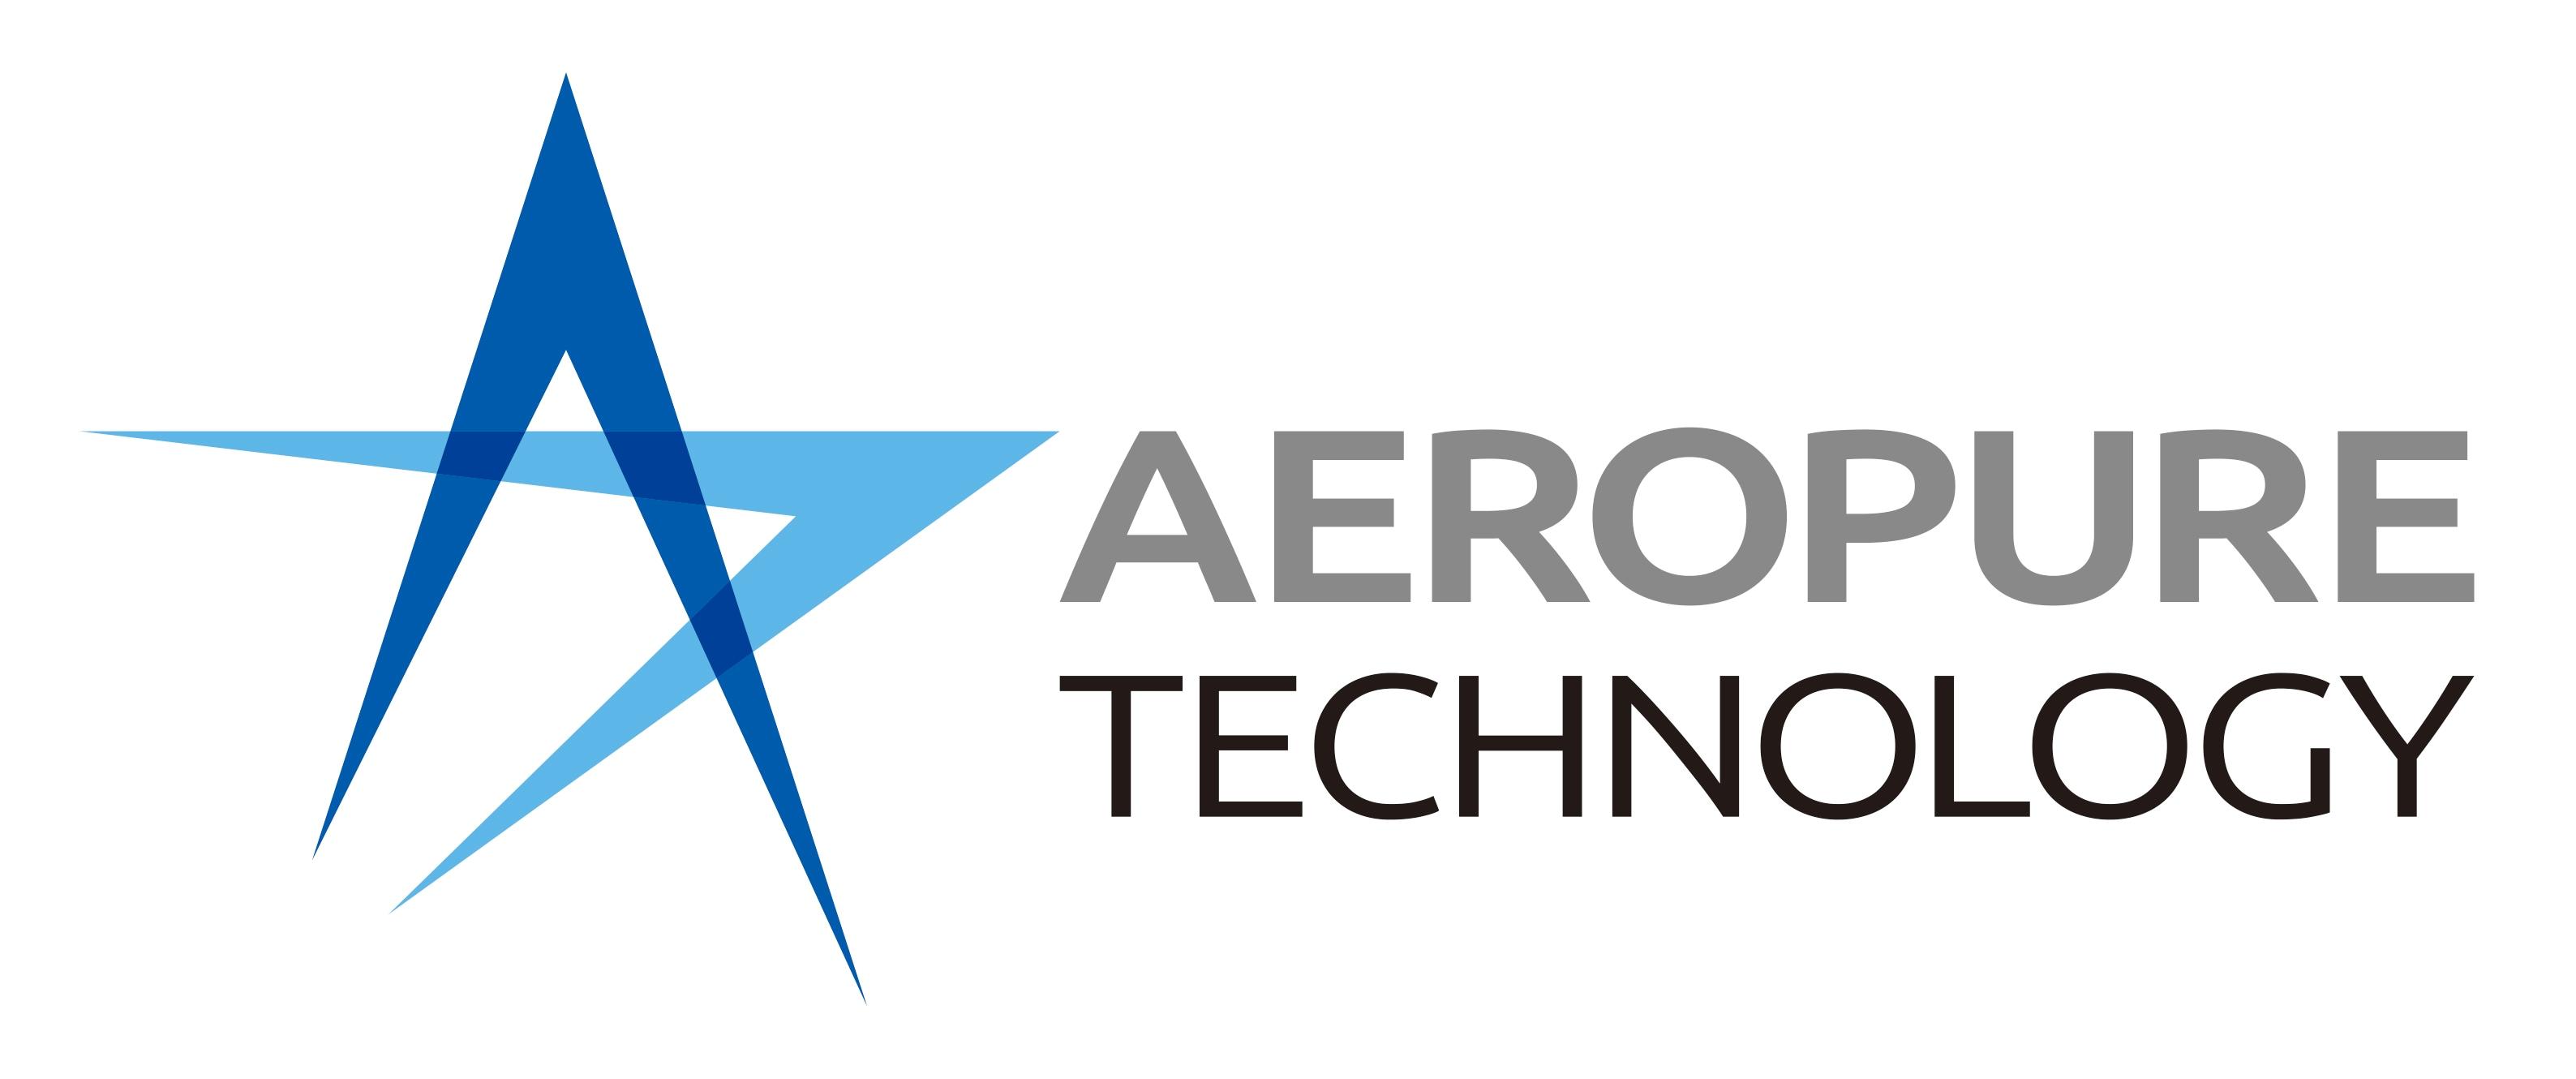 aeropuretechnologyロゴ